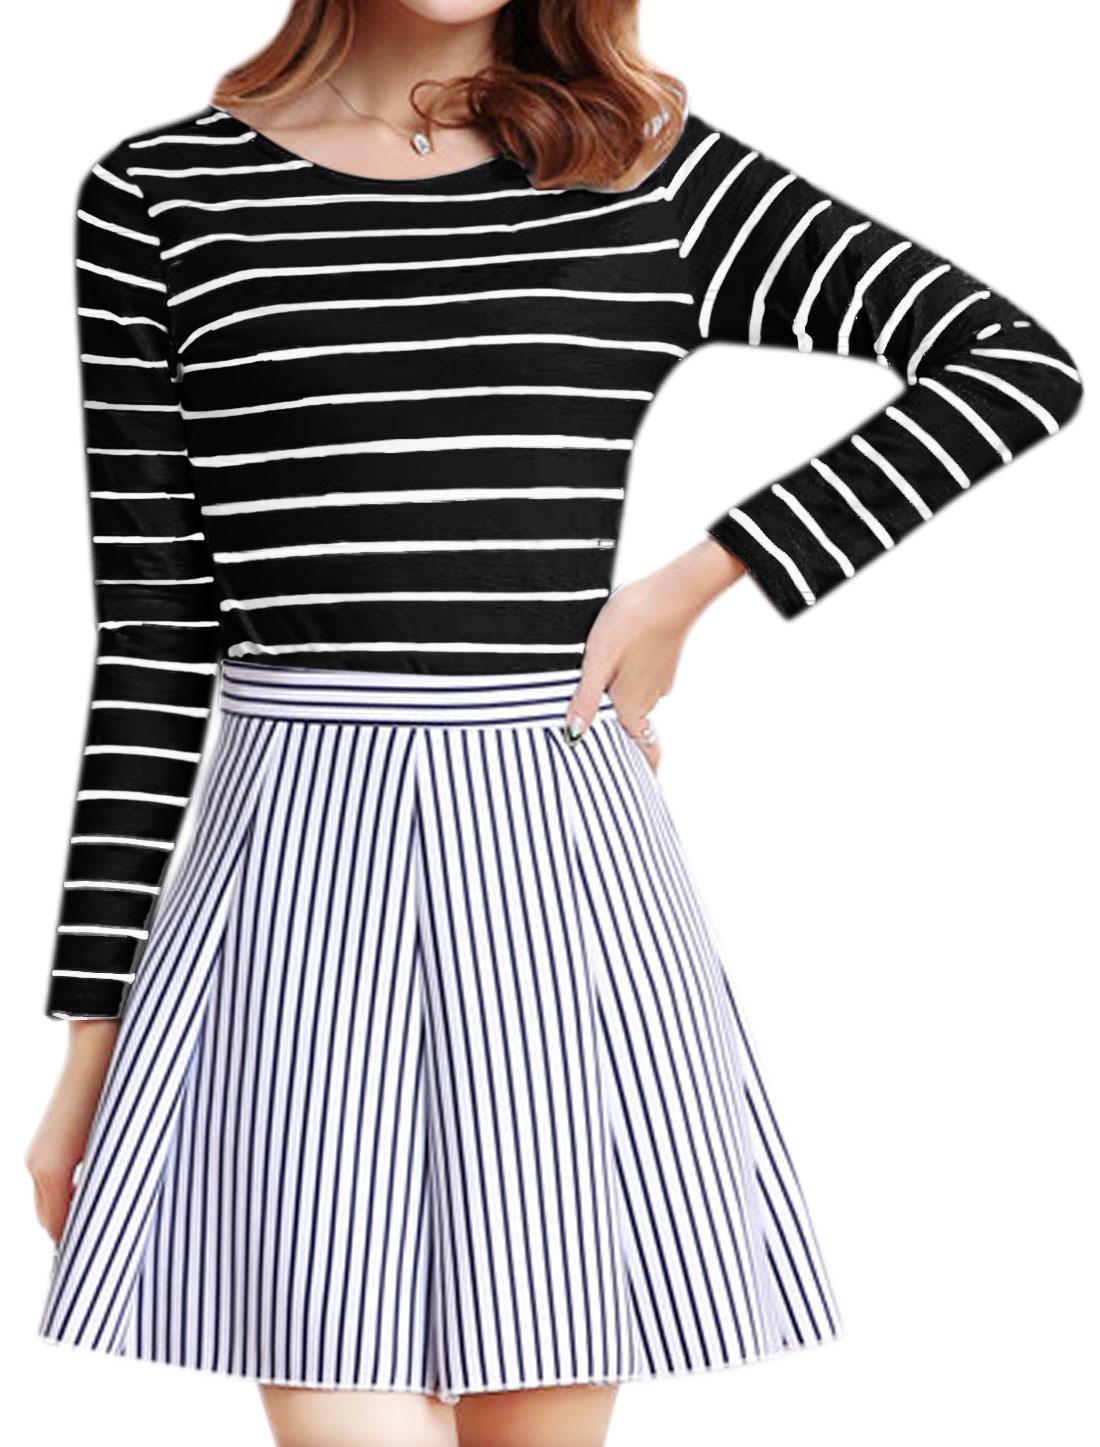 Women Long Sleeves Round Neck Slim Fit Stripes Tee Shirt Black S